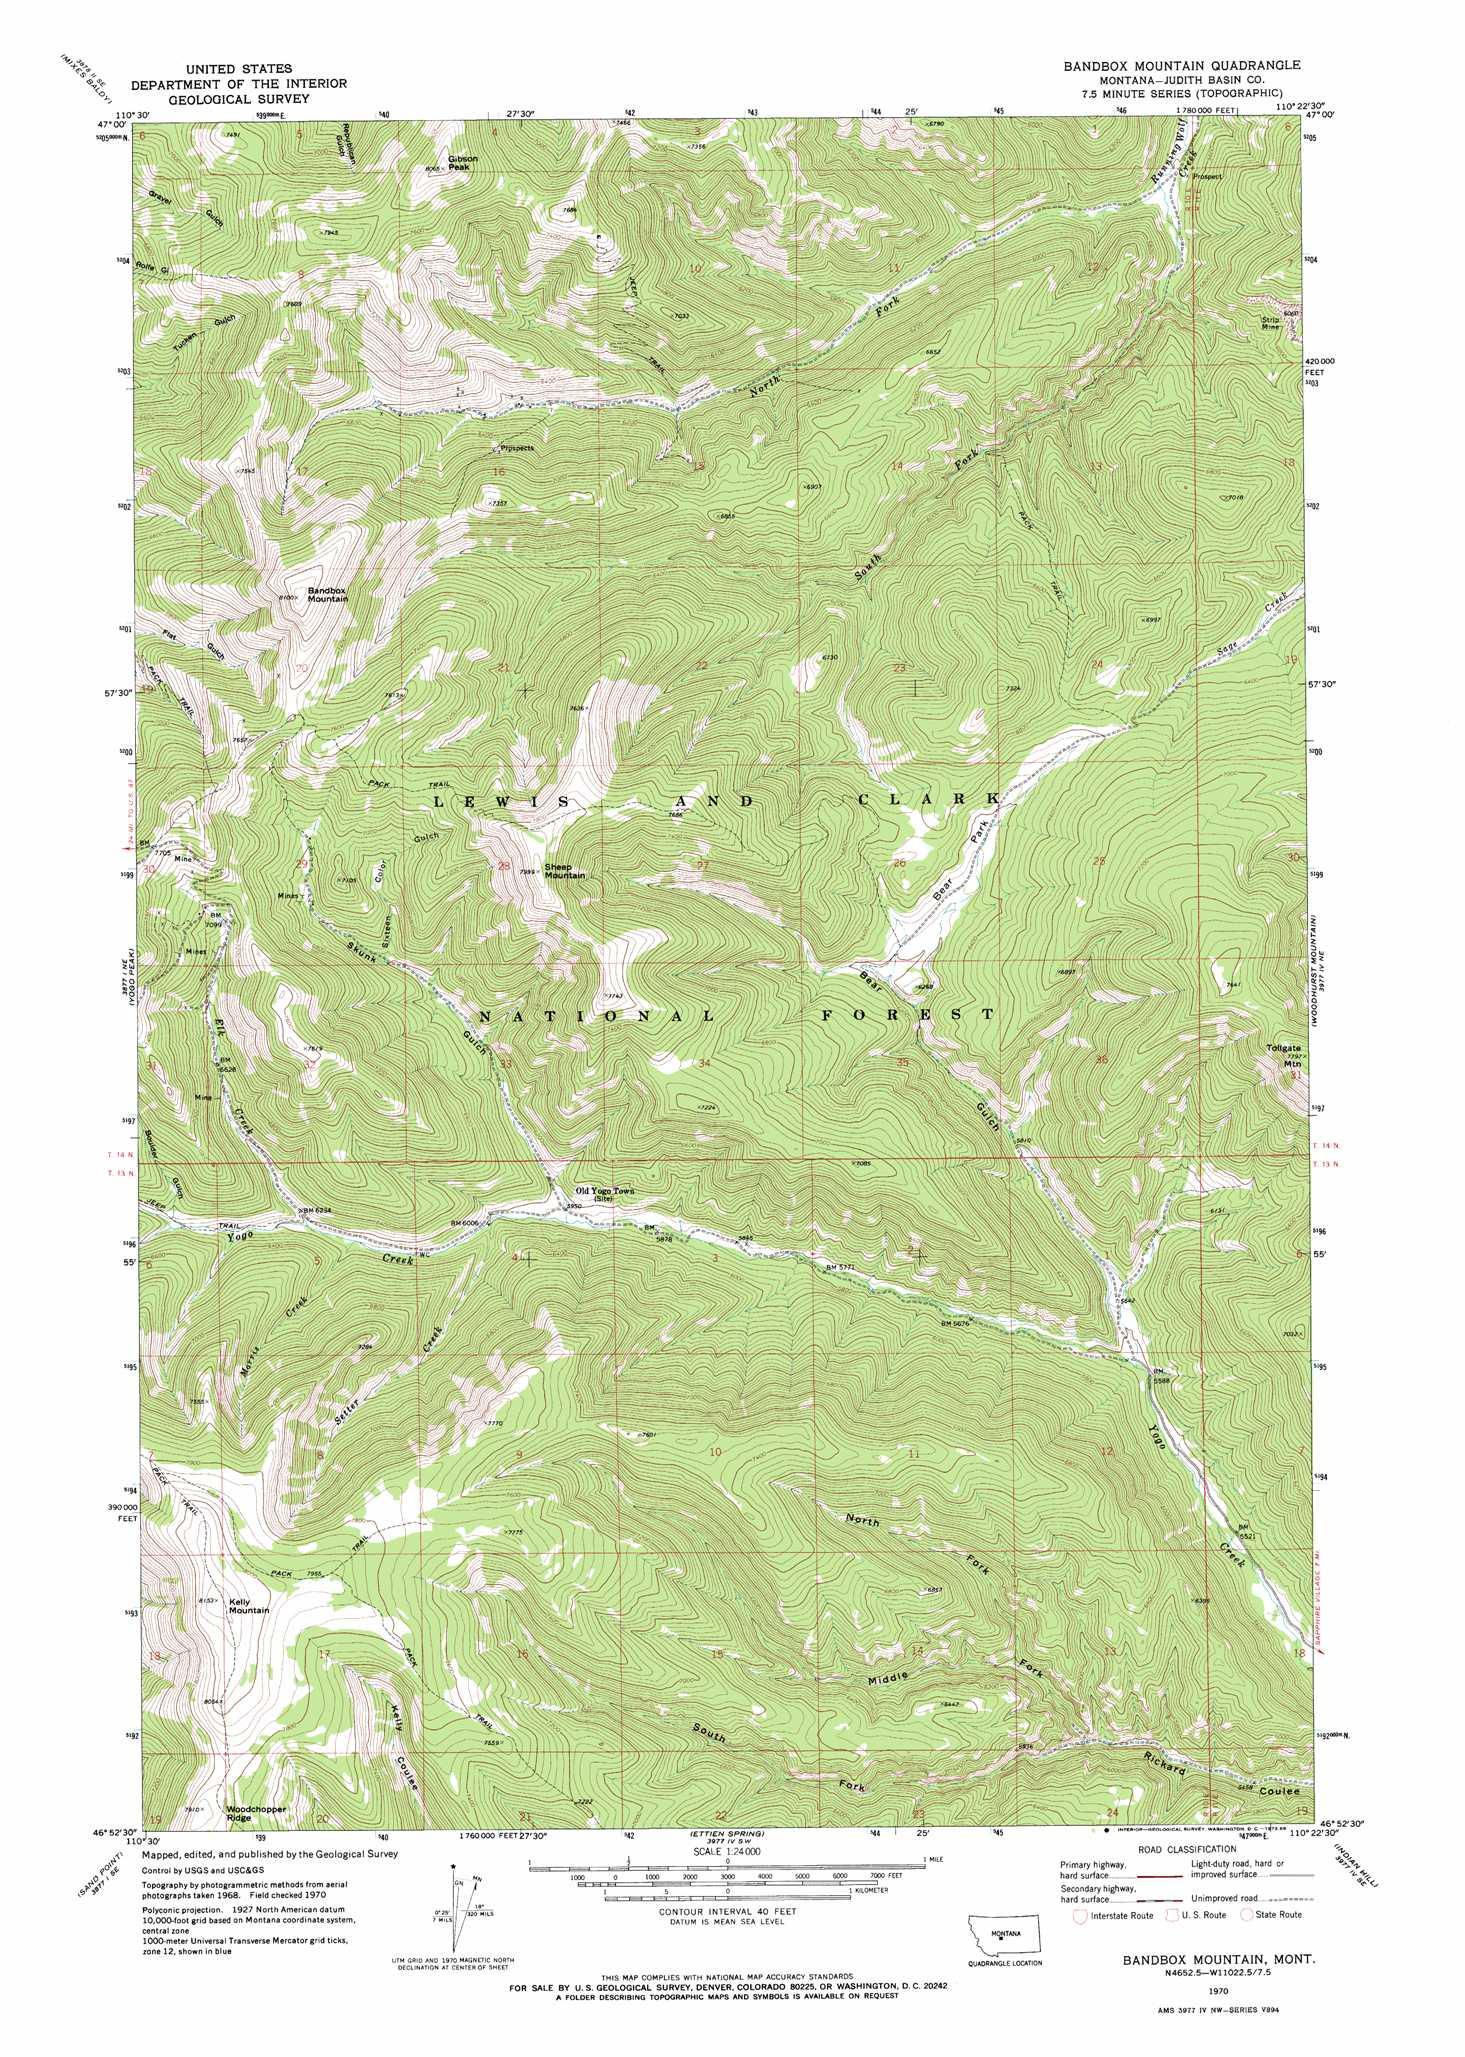 Band Box Mountain topographic map, MT - USGS Topo Quad 46110h4